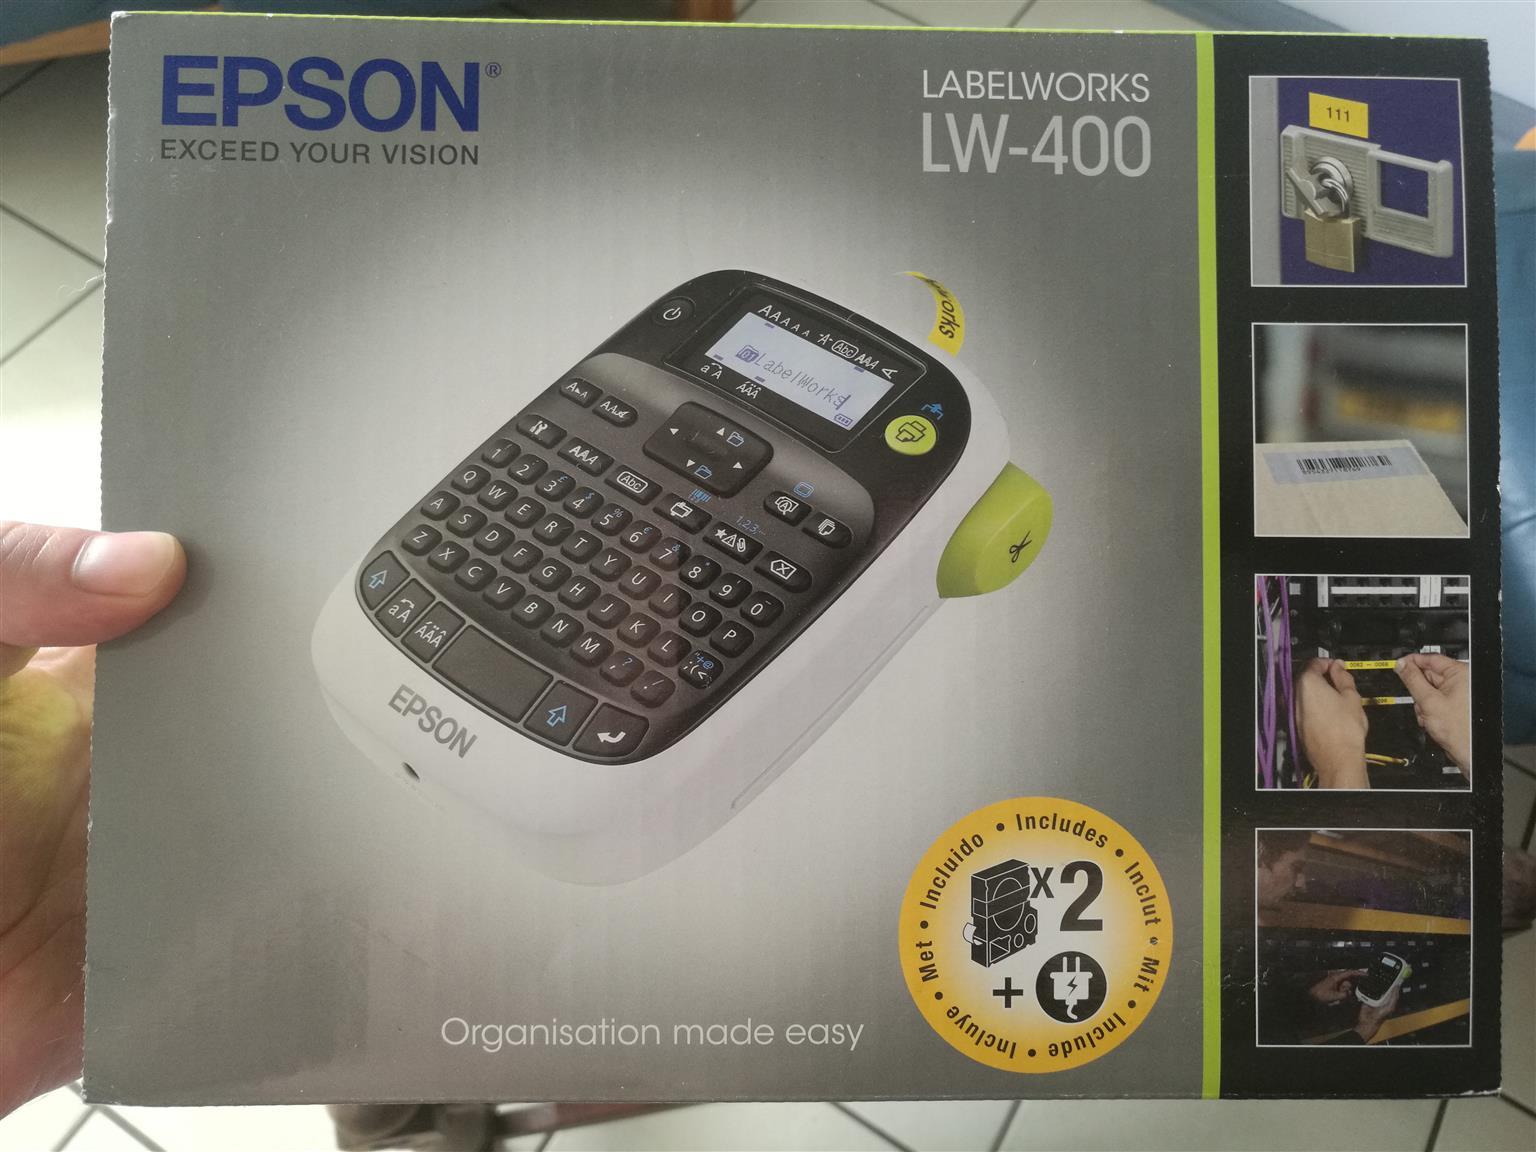 Epson LW-400 Label Printer